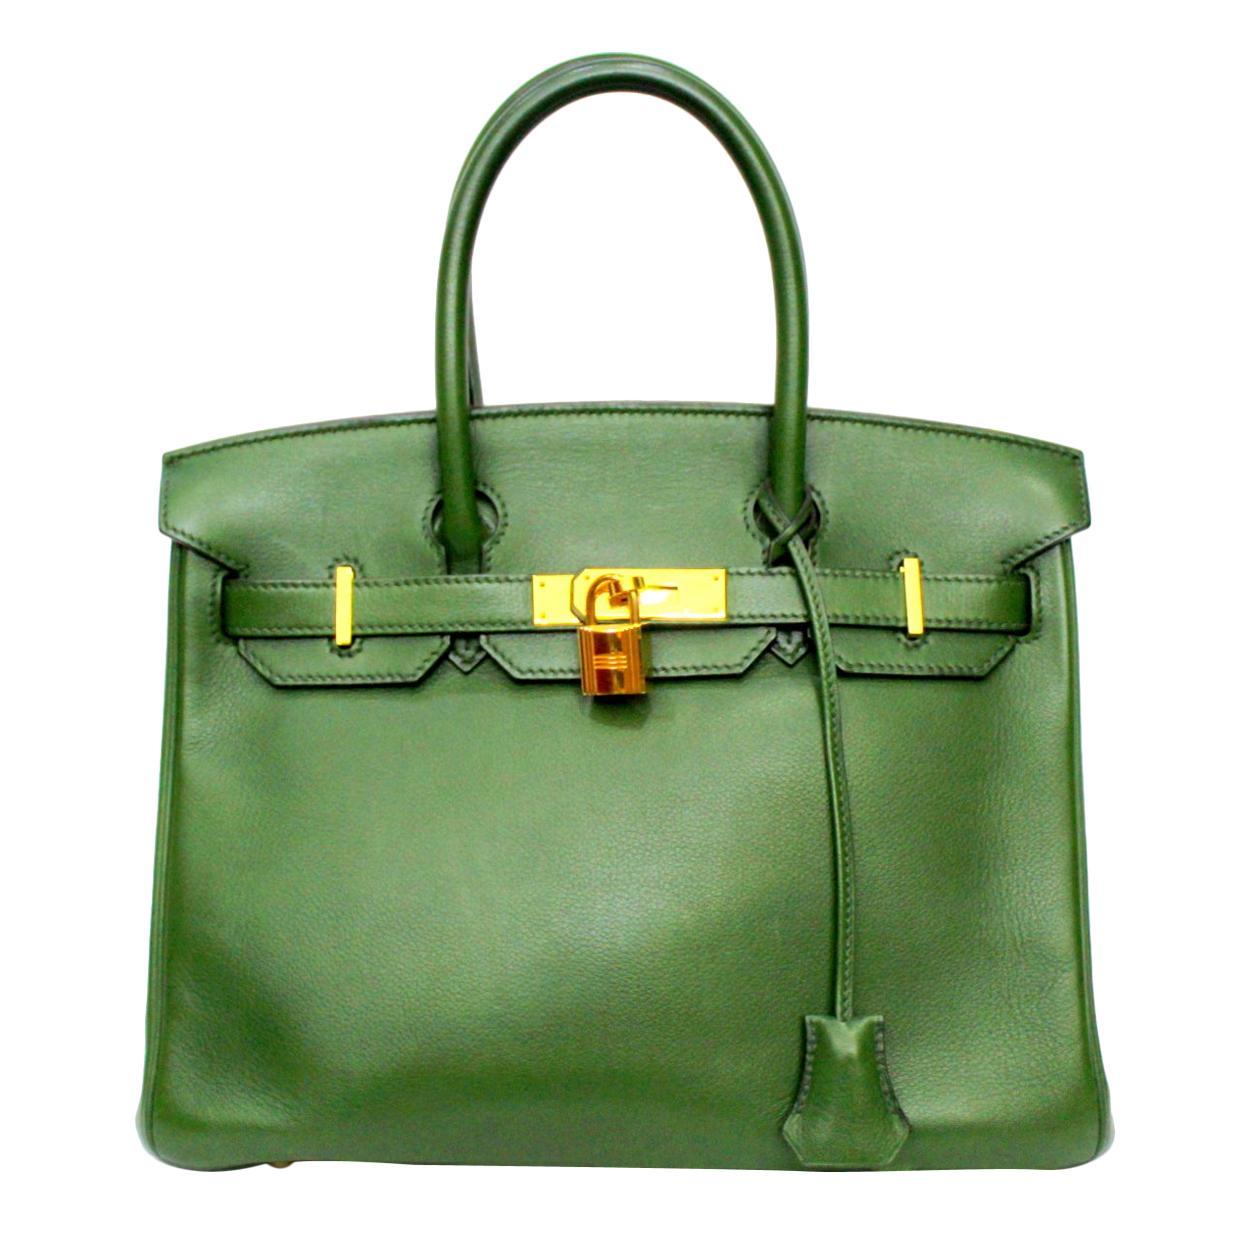 2011 Hermès Forest Green Leather Birkin 30 Bag